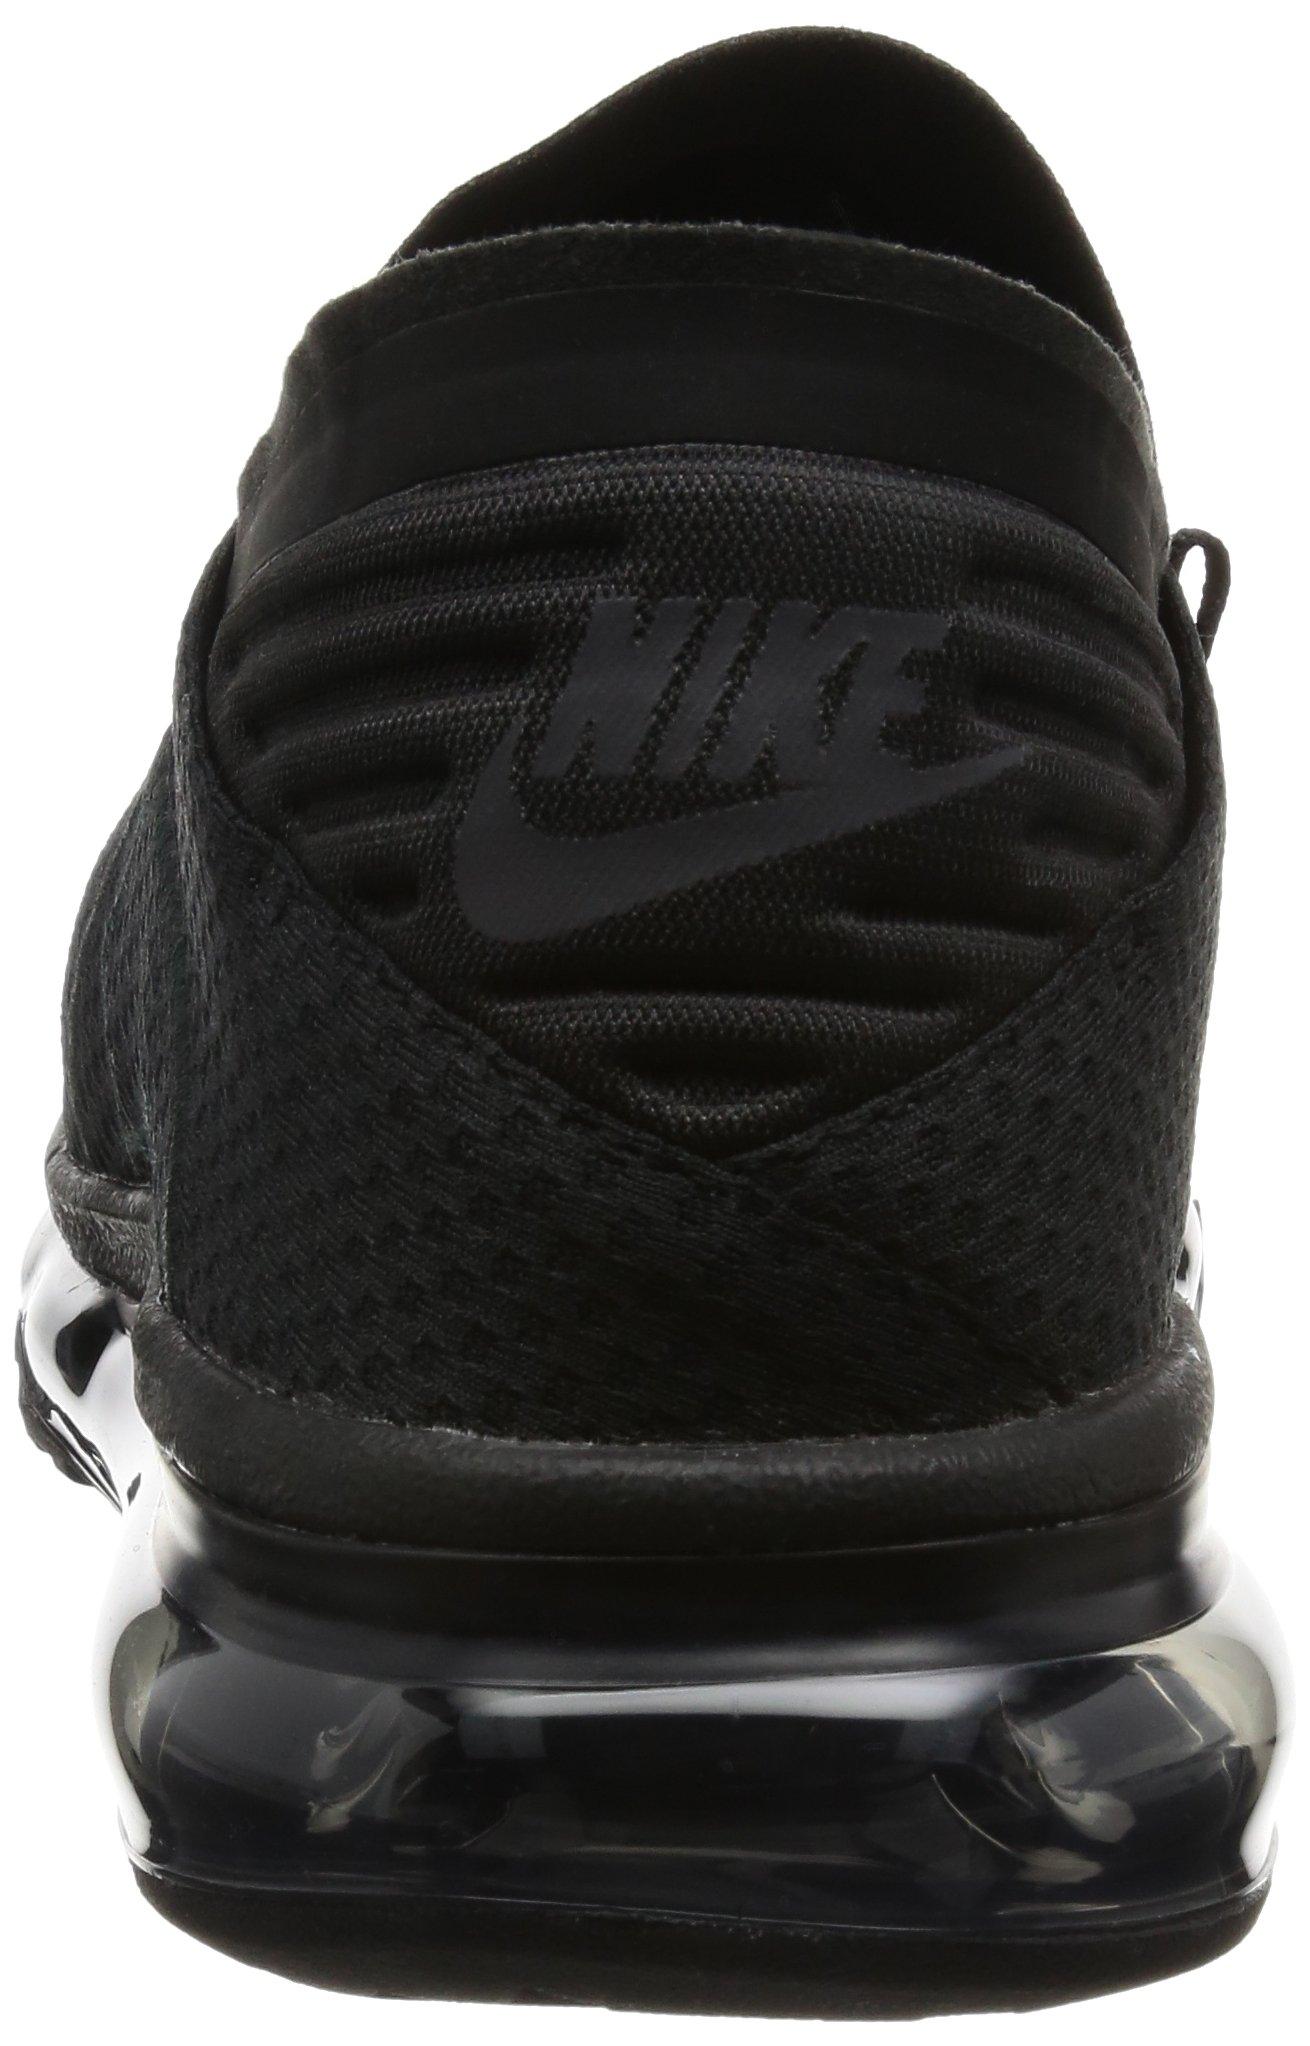 Nike Men's Air Max Flair, Black/ANTHRACIE, 10 M US by Nike (Image #2)